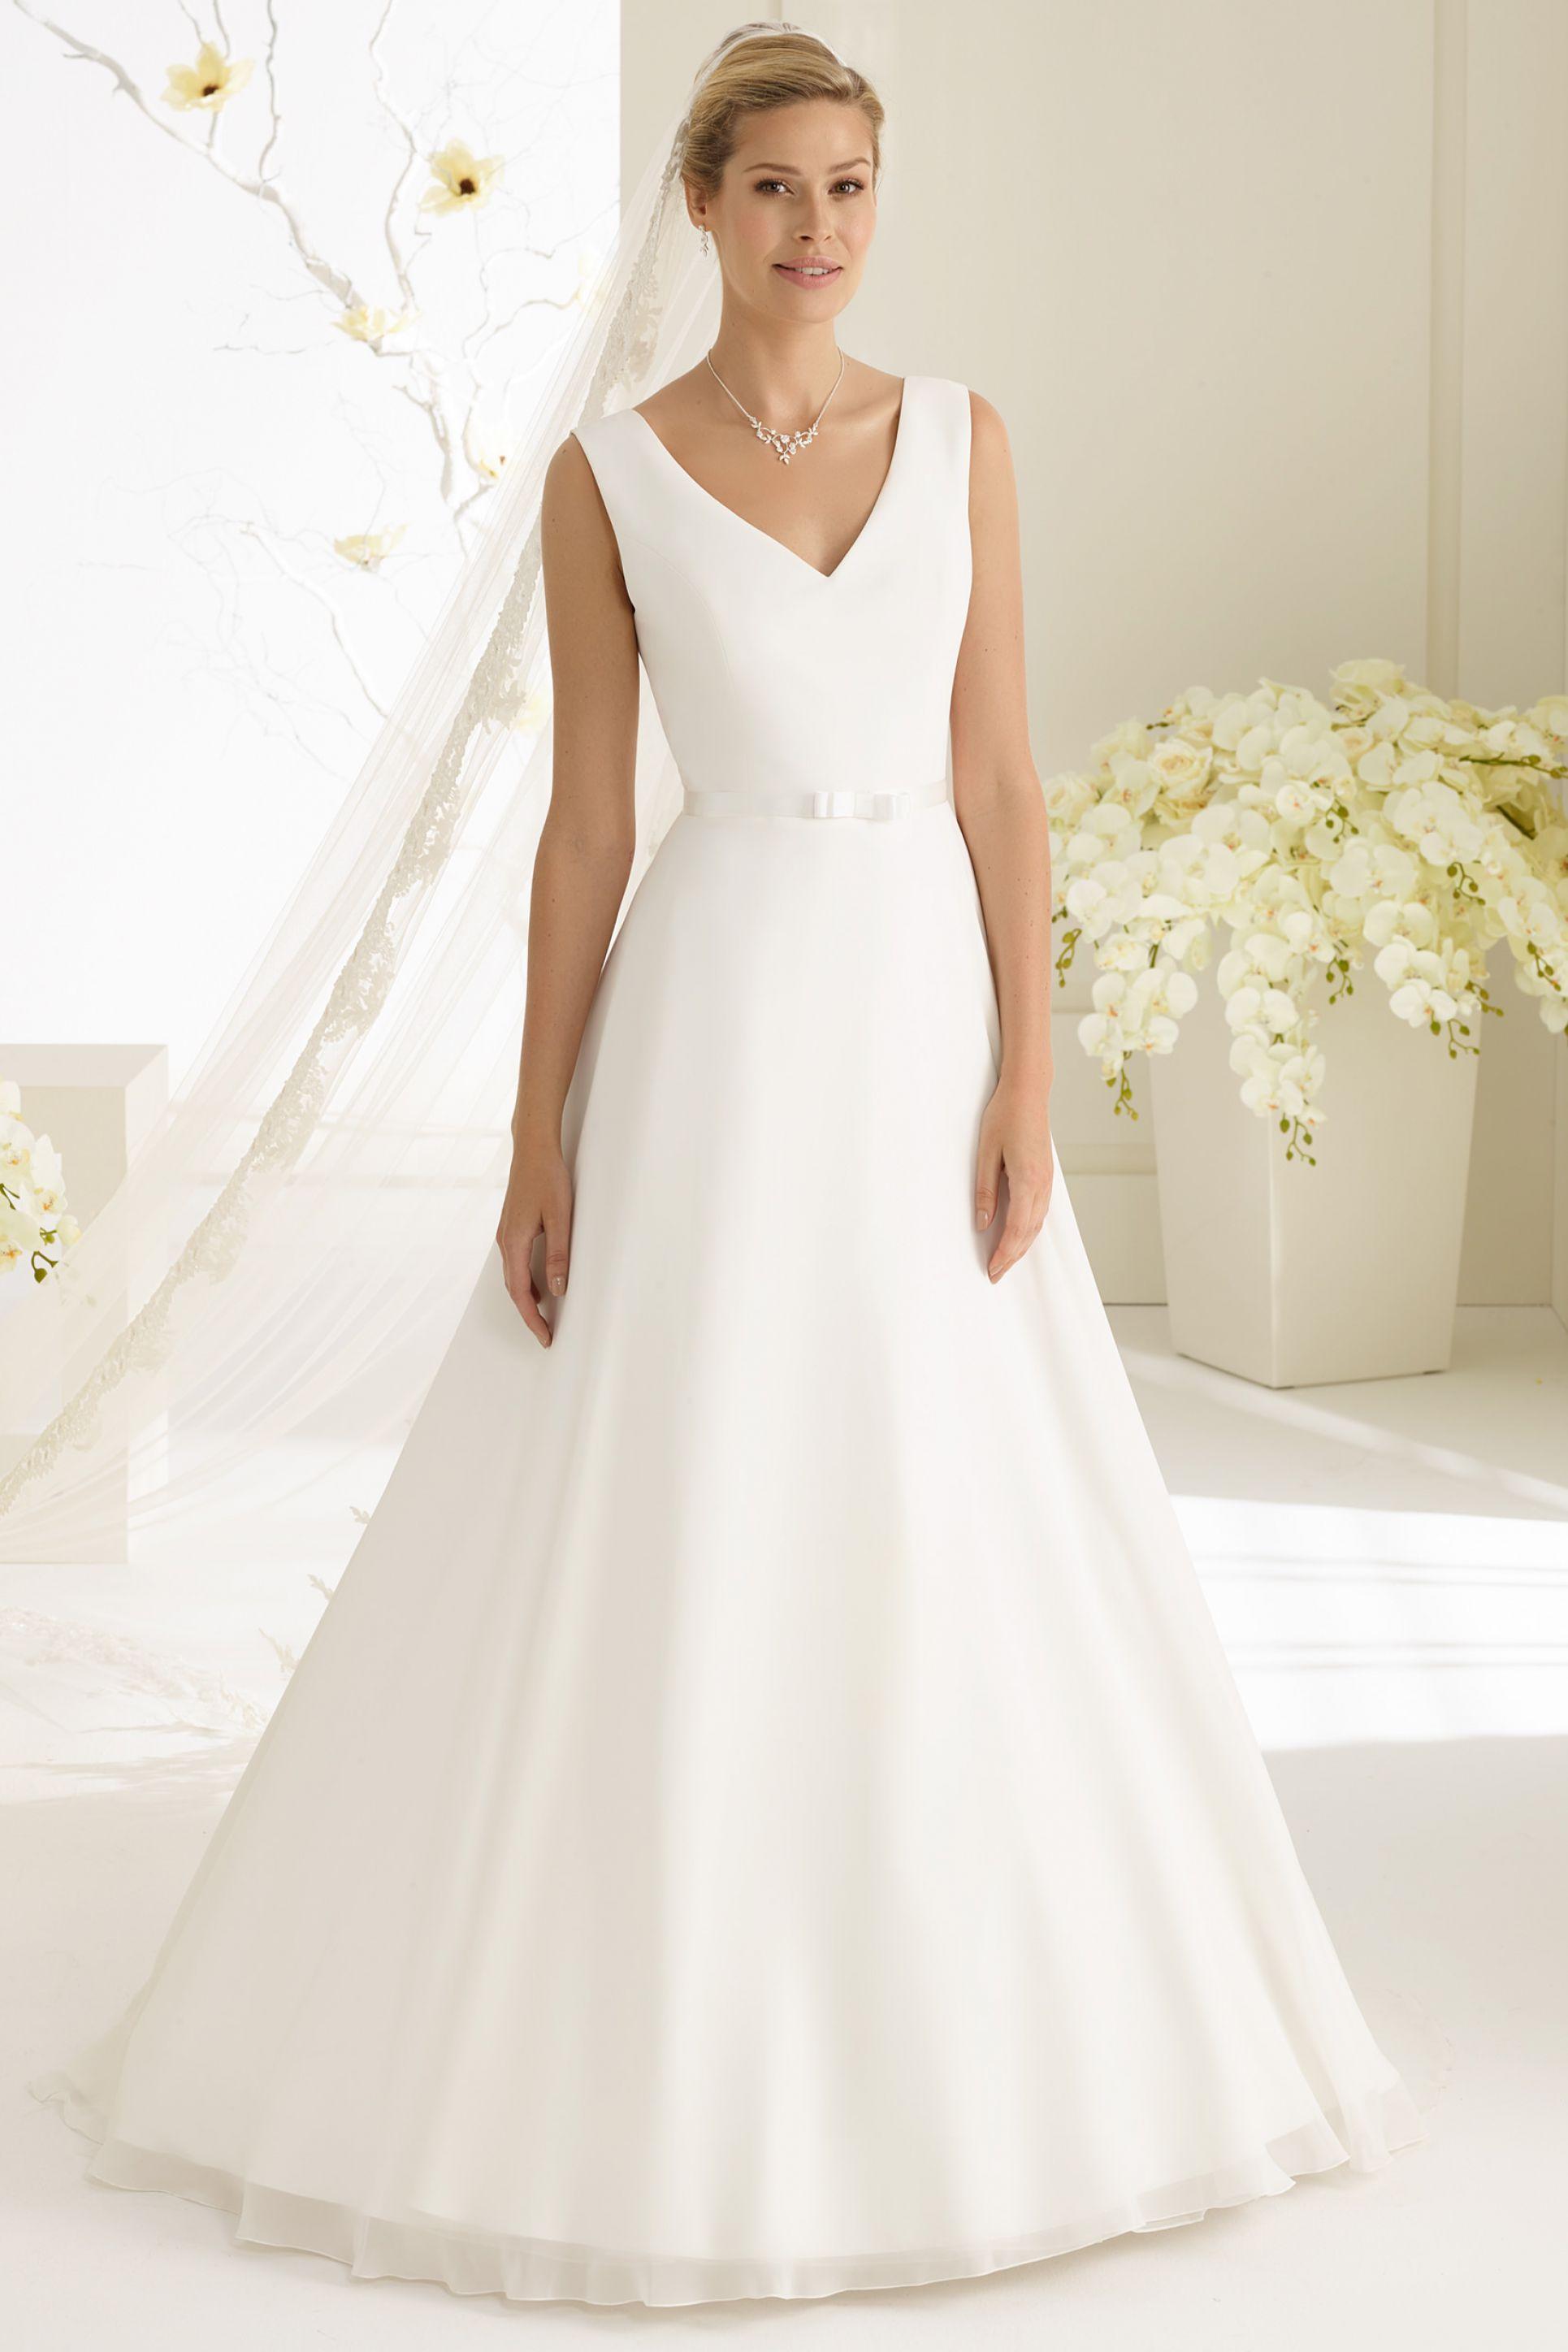 b0b238a6200 Νυφικό «Dalia» - Νυφικά Πολιτικού Γάμου   Νυφικά Είμαι Νύφη